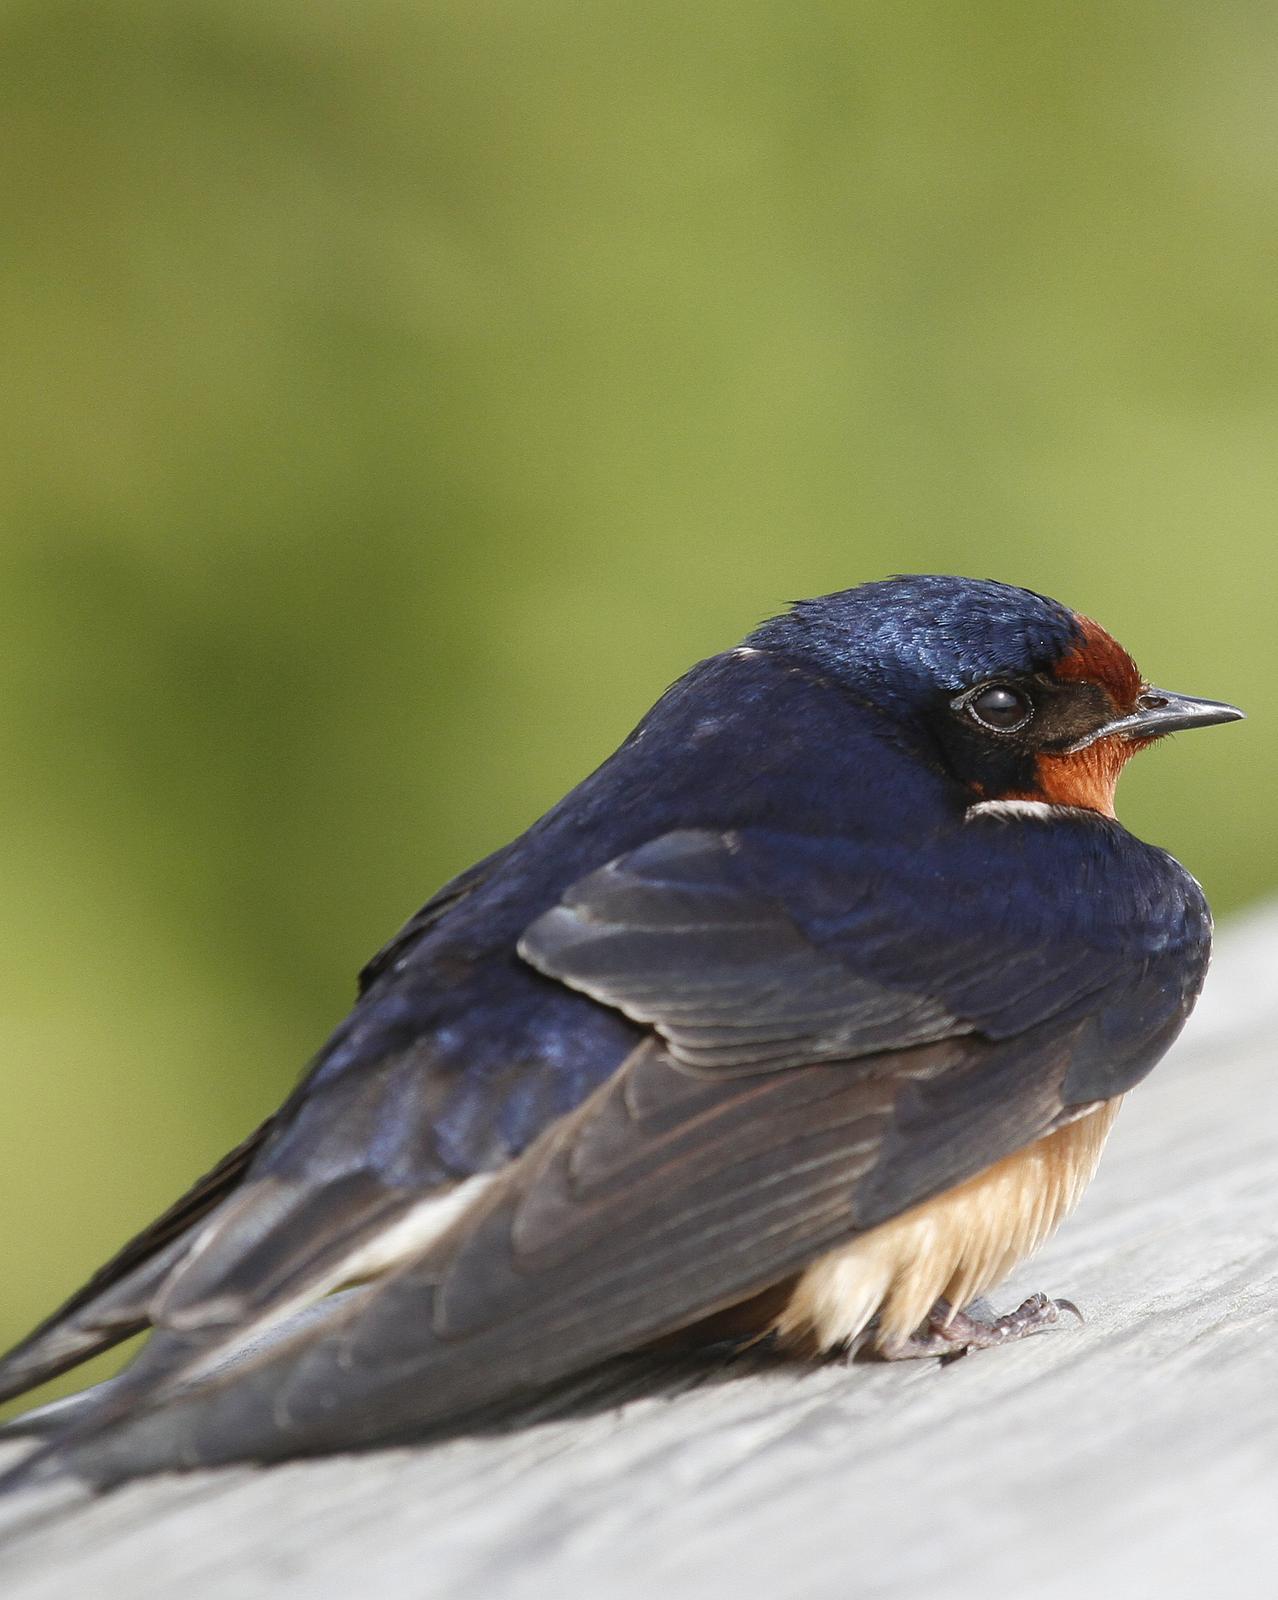 Barn Swallow Photo by Isaac Sanchez